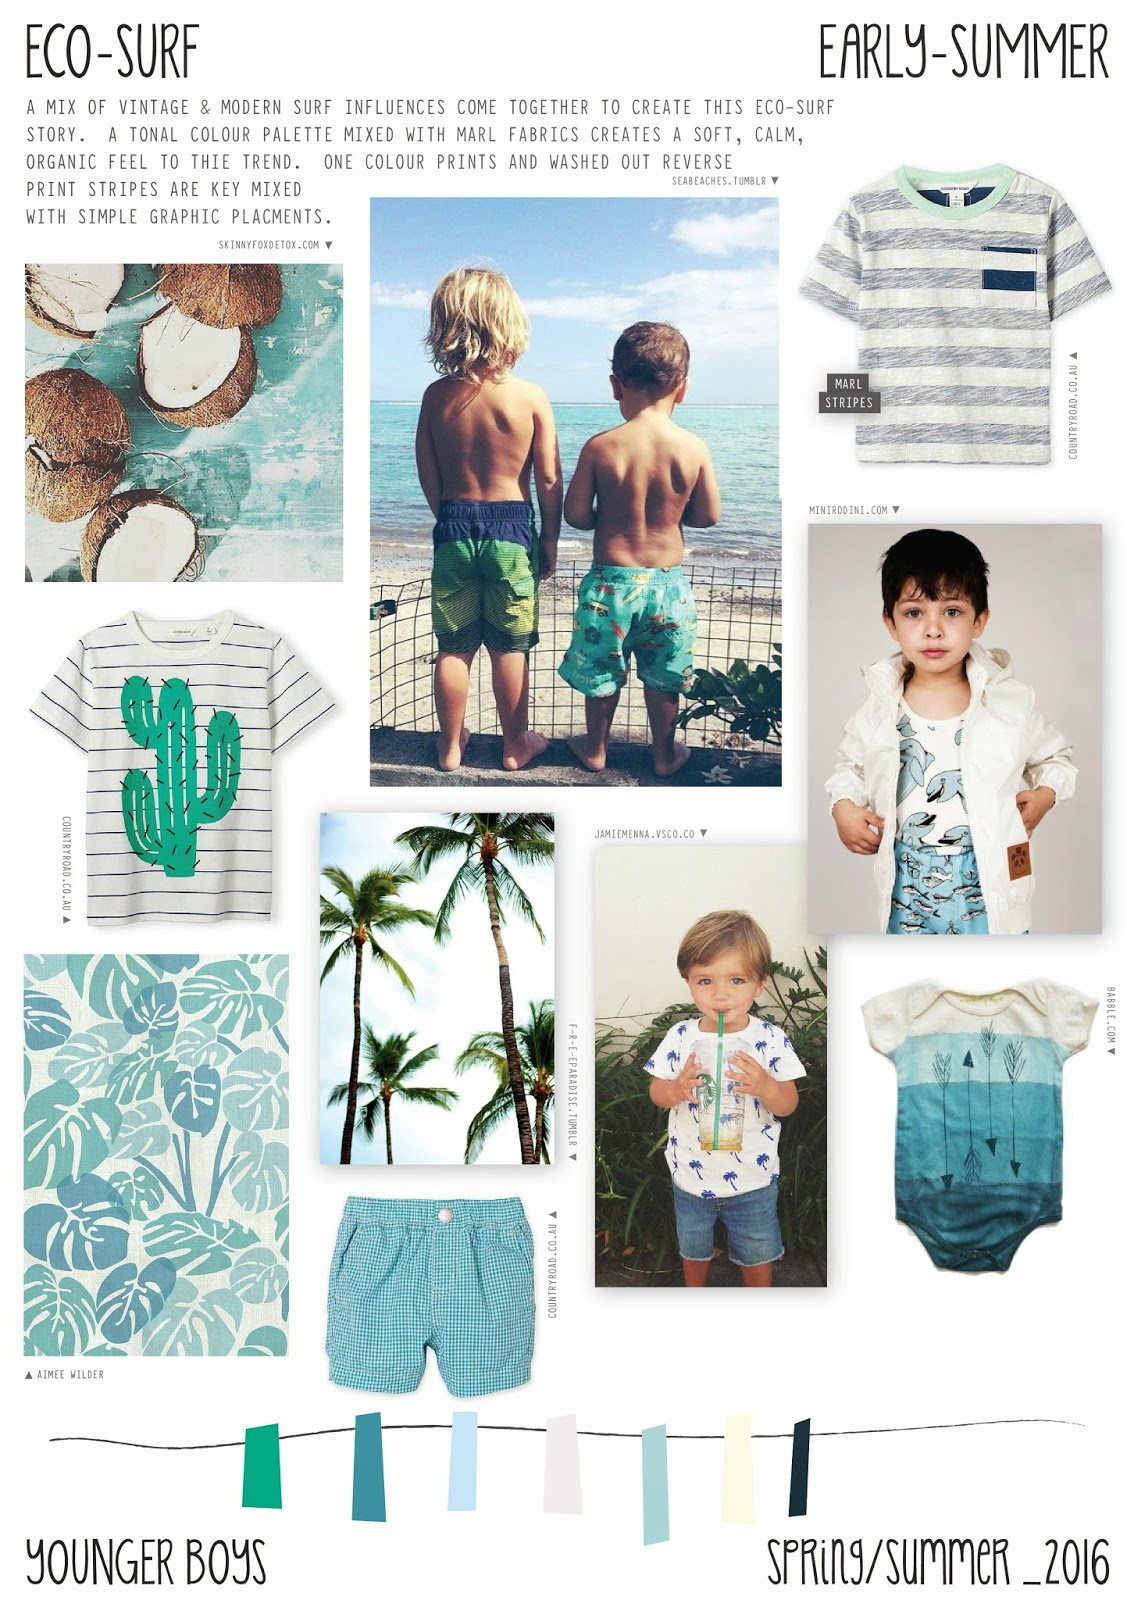 emily kiddy spring summer 2016 younger boys fashion eco surf trend. Black Bedroom Furniture Sets. Home Design Ideas